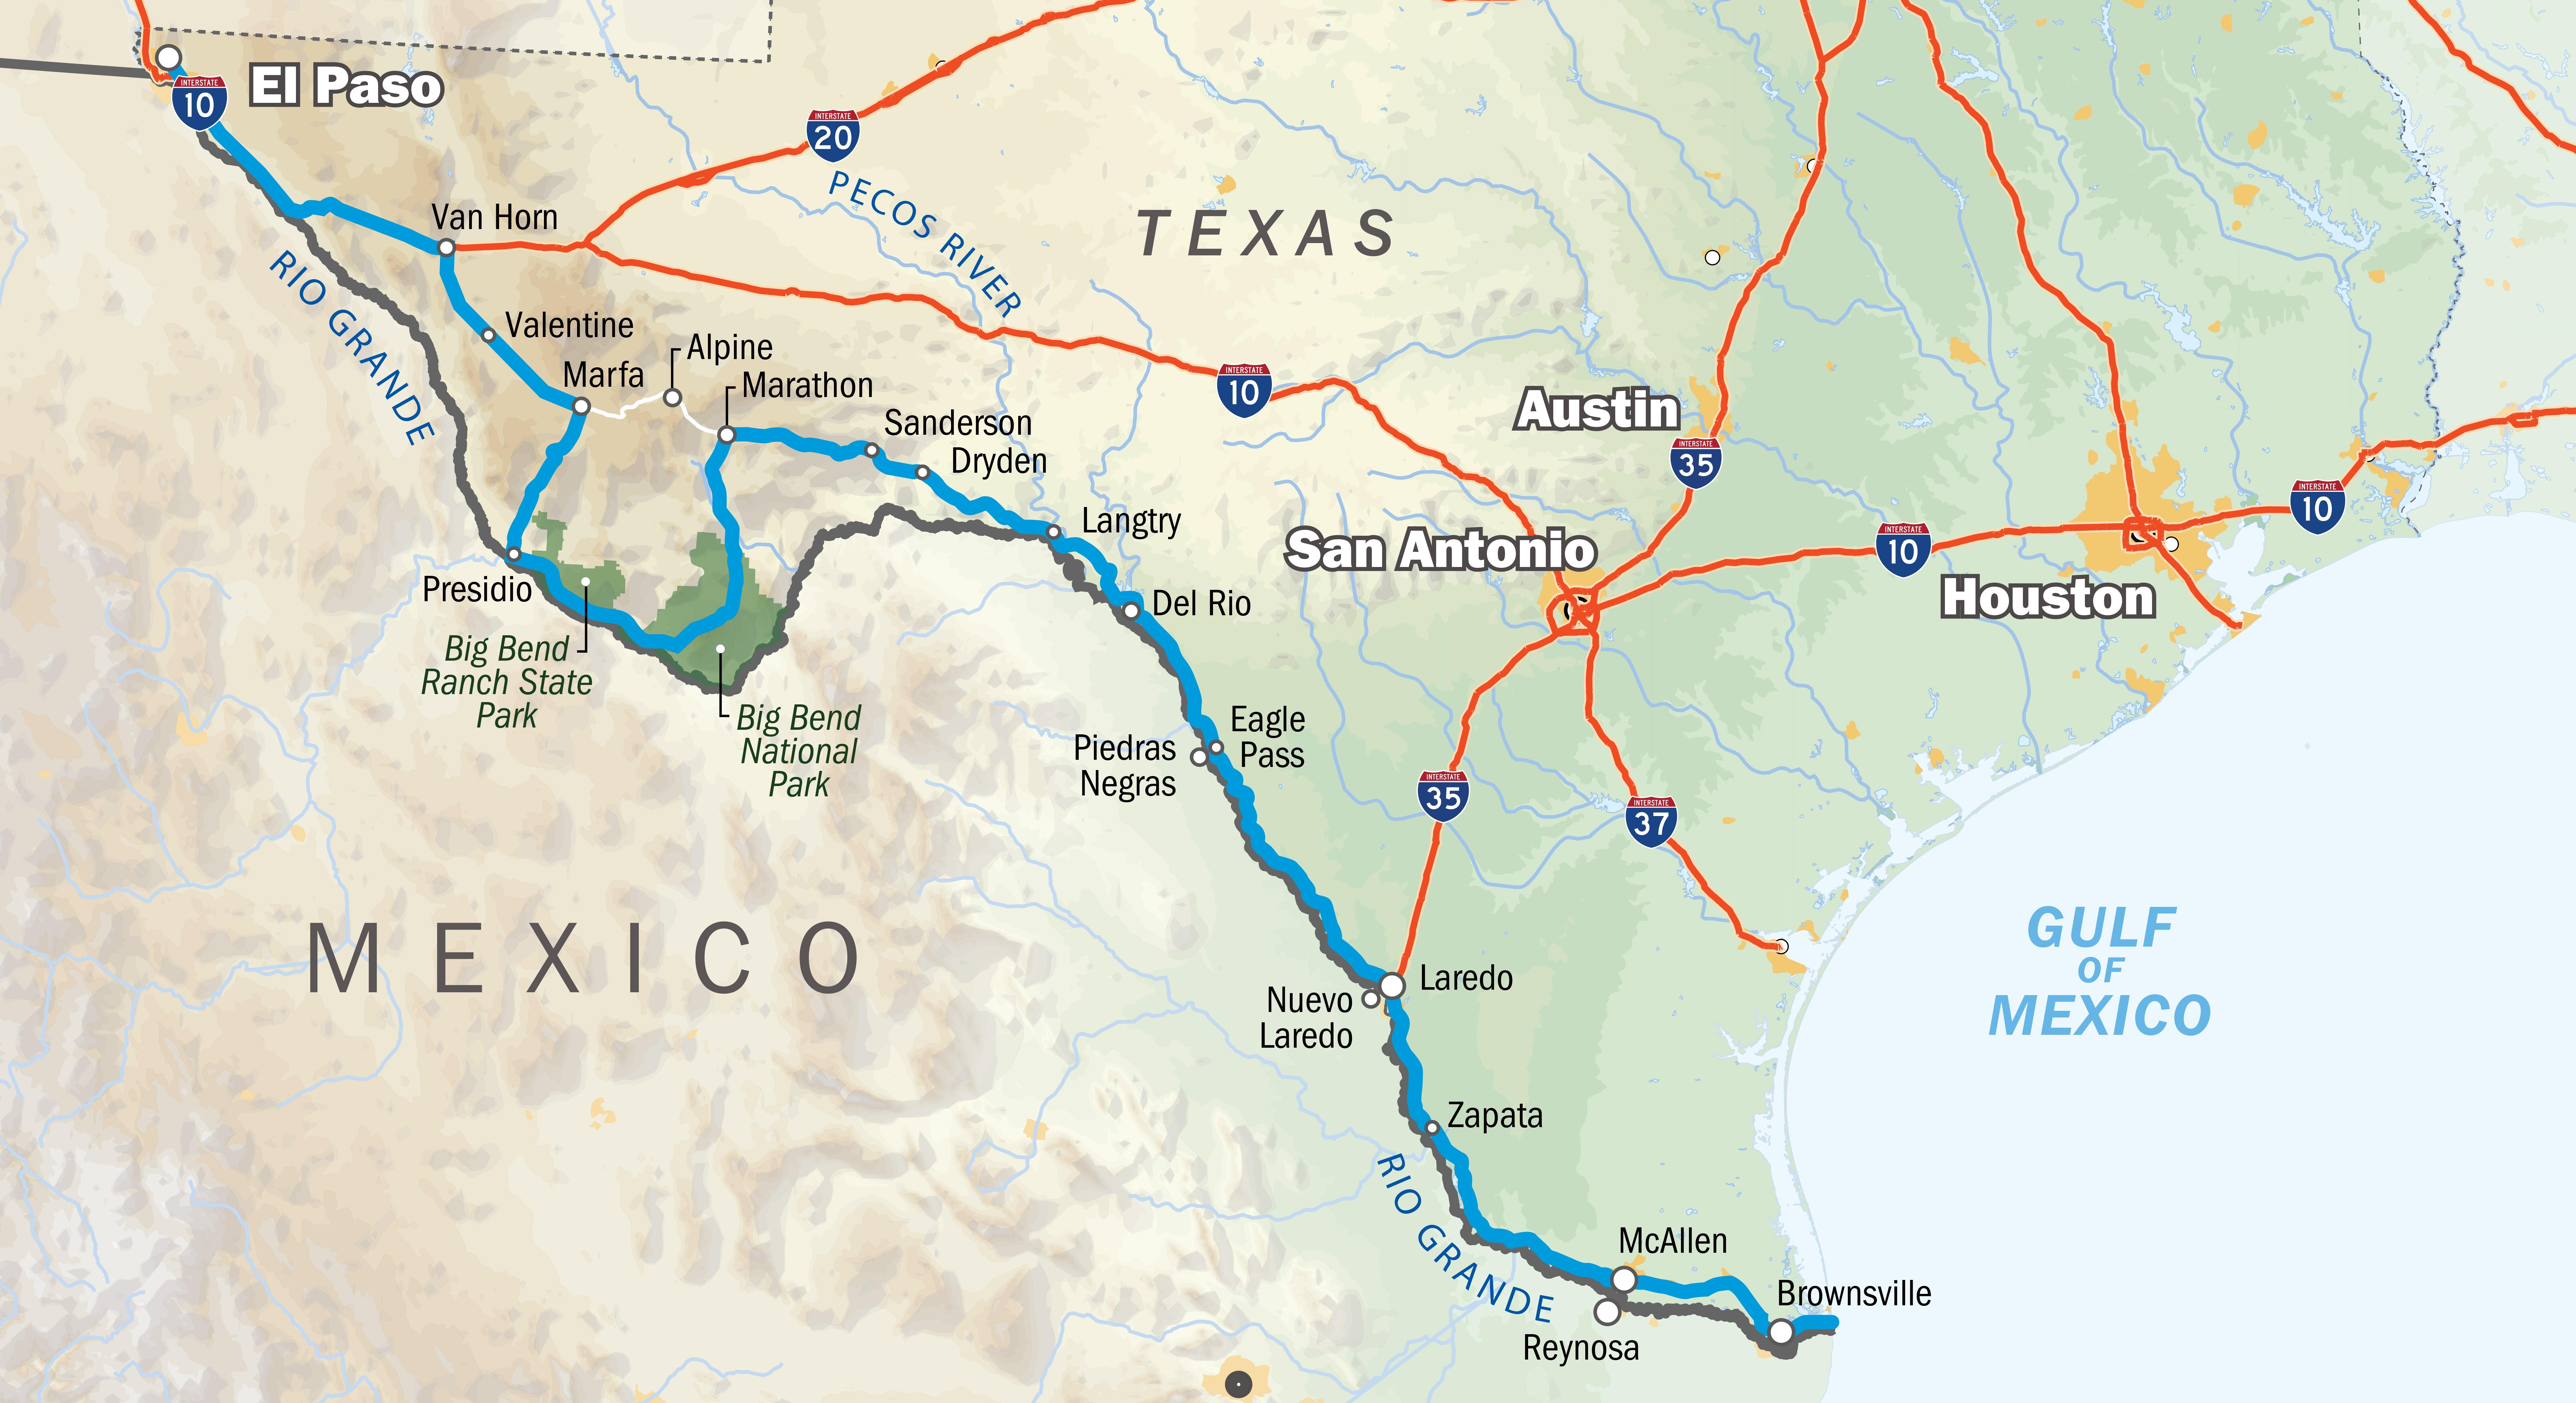 U.S.-Mexico Border: Why a Wall Won't Fix the Problems in ... on powell tx map, shepherd tx map, robert lee tx map, palmer tx map, mason tx map, henderson tx map, clarksville tx map, mansfield tx map, vernon tx map, anderson tx map, orange tx map, tuleta tx map, sheffield tx map, anthony tx map, andrews tx map, san isidro tx map, greenville tx map, uvalde tx map, snyder tx map, balmorhea tx map,